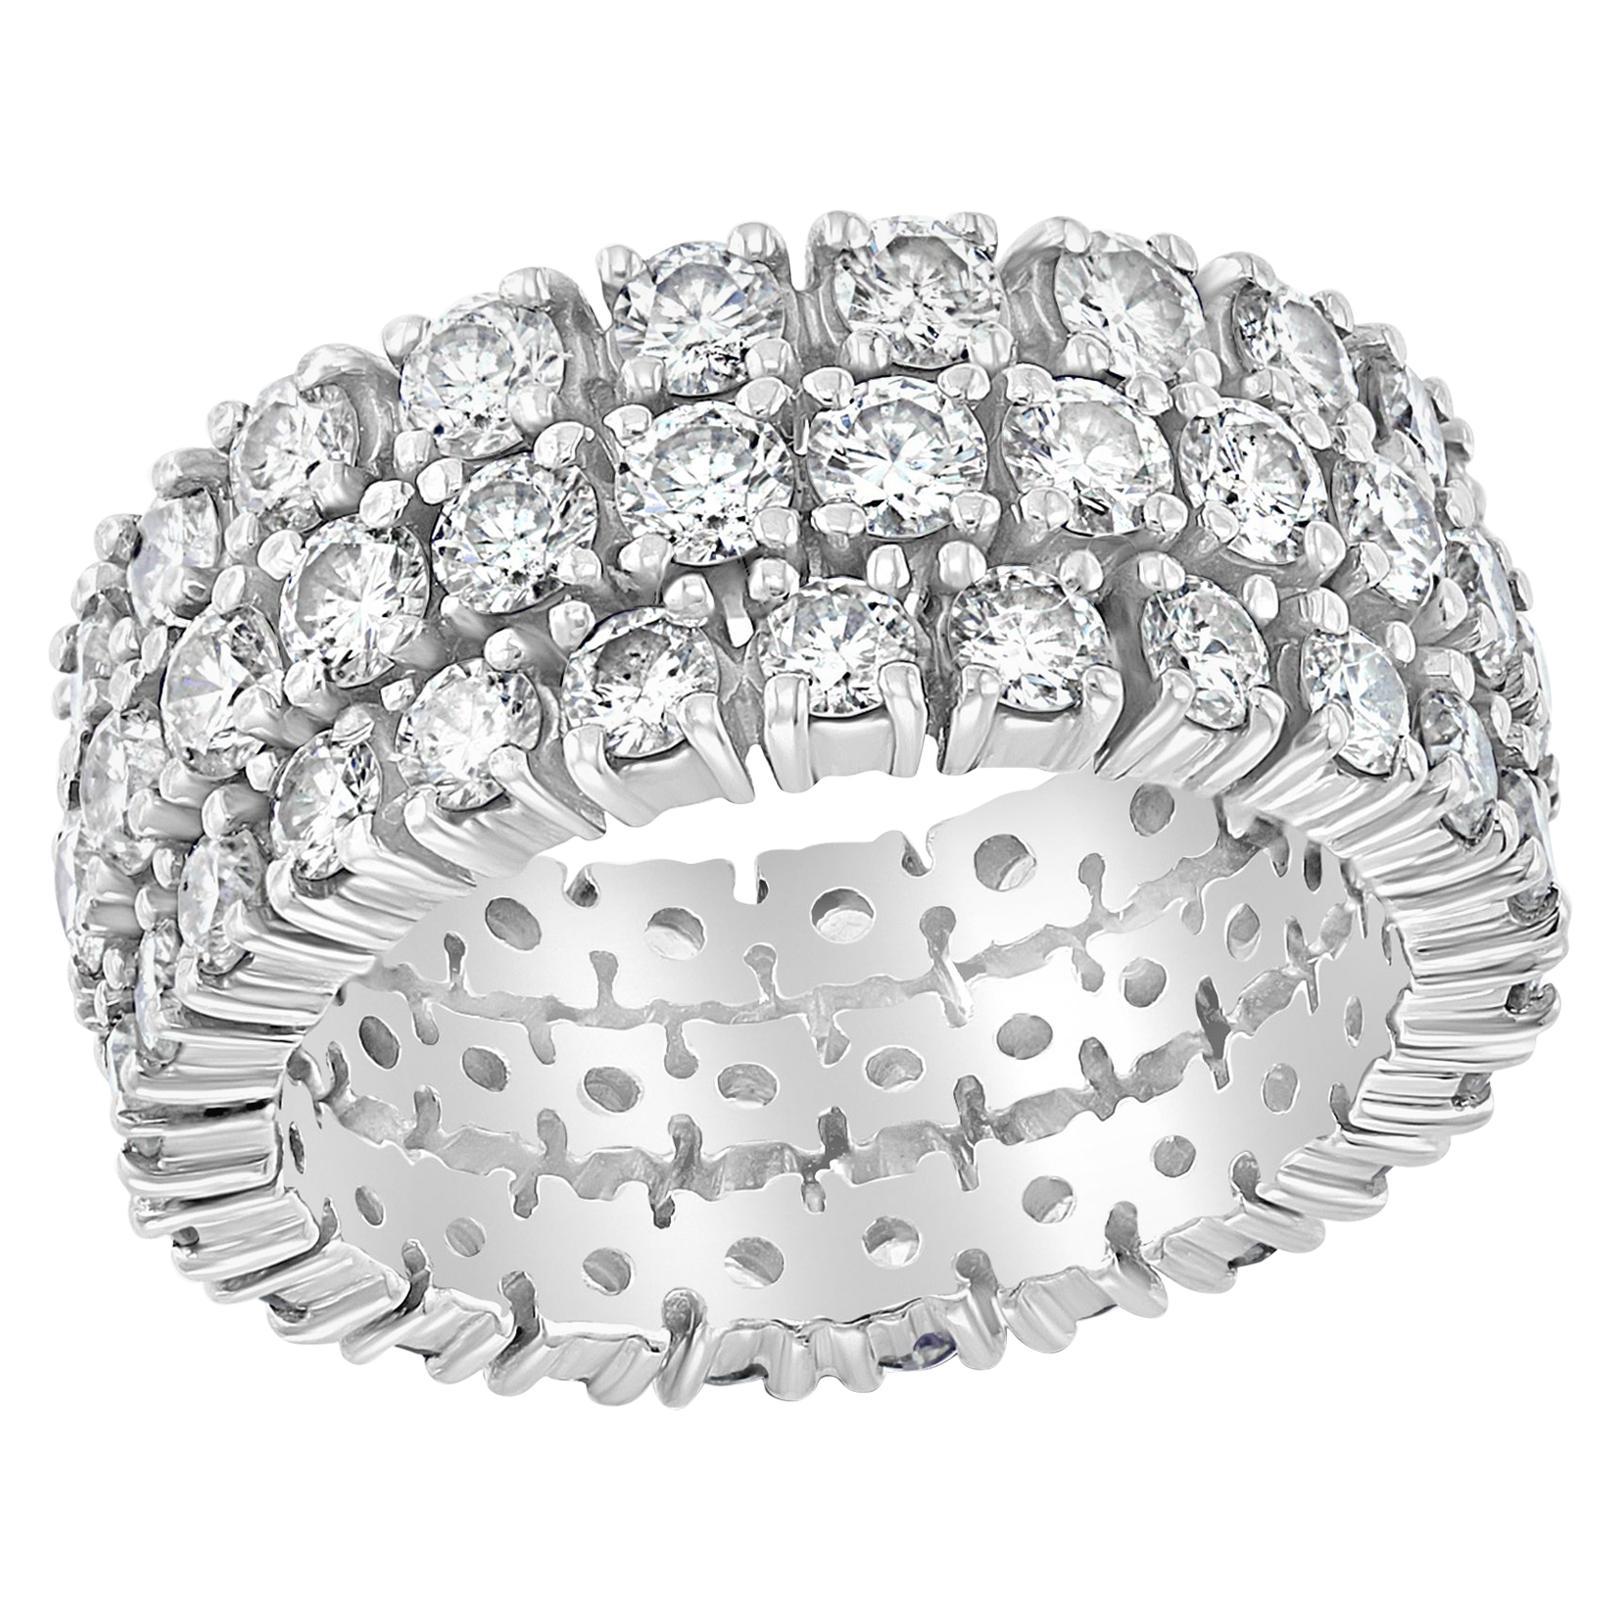 4 Carat Diamond Eternity Engagement Band 14 Karat White Gold 3-Row Band